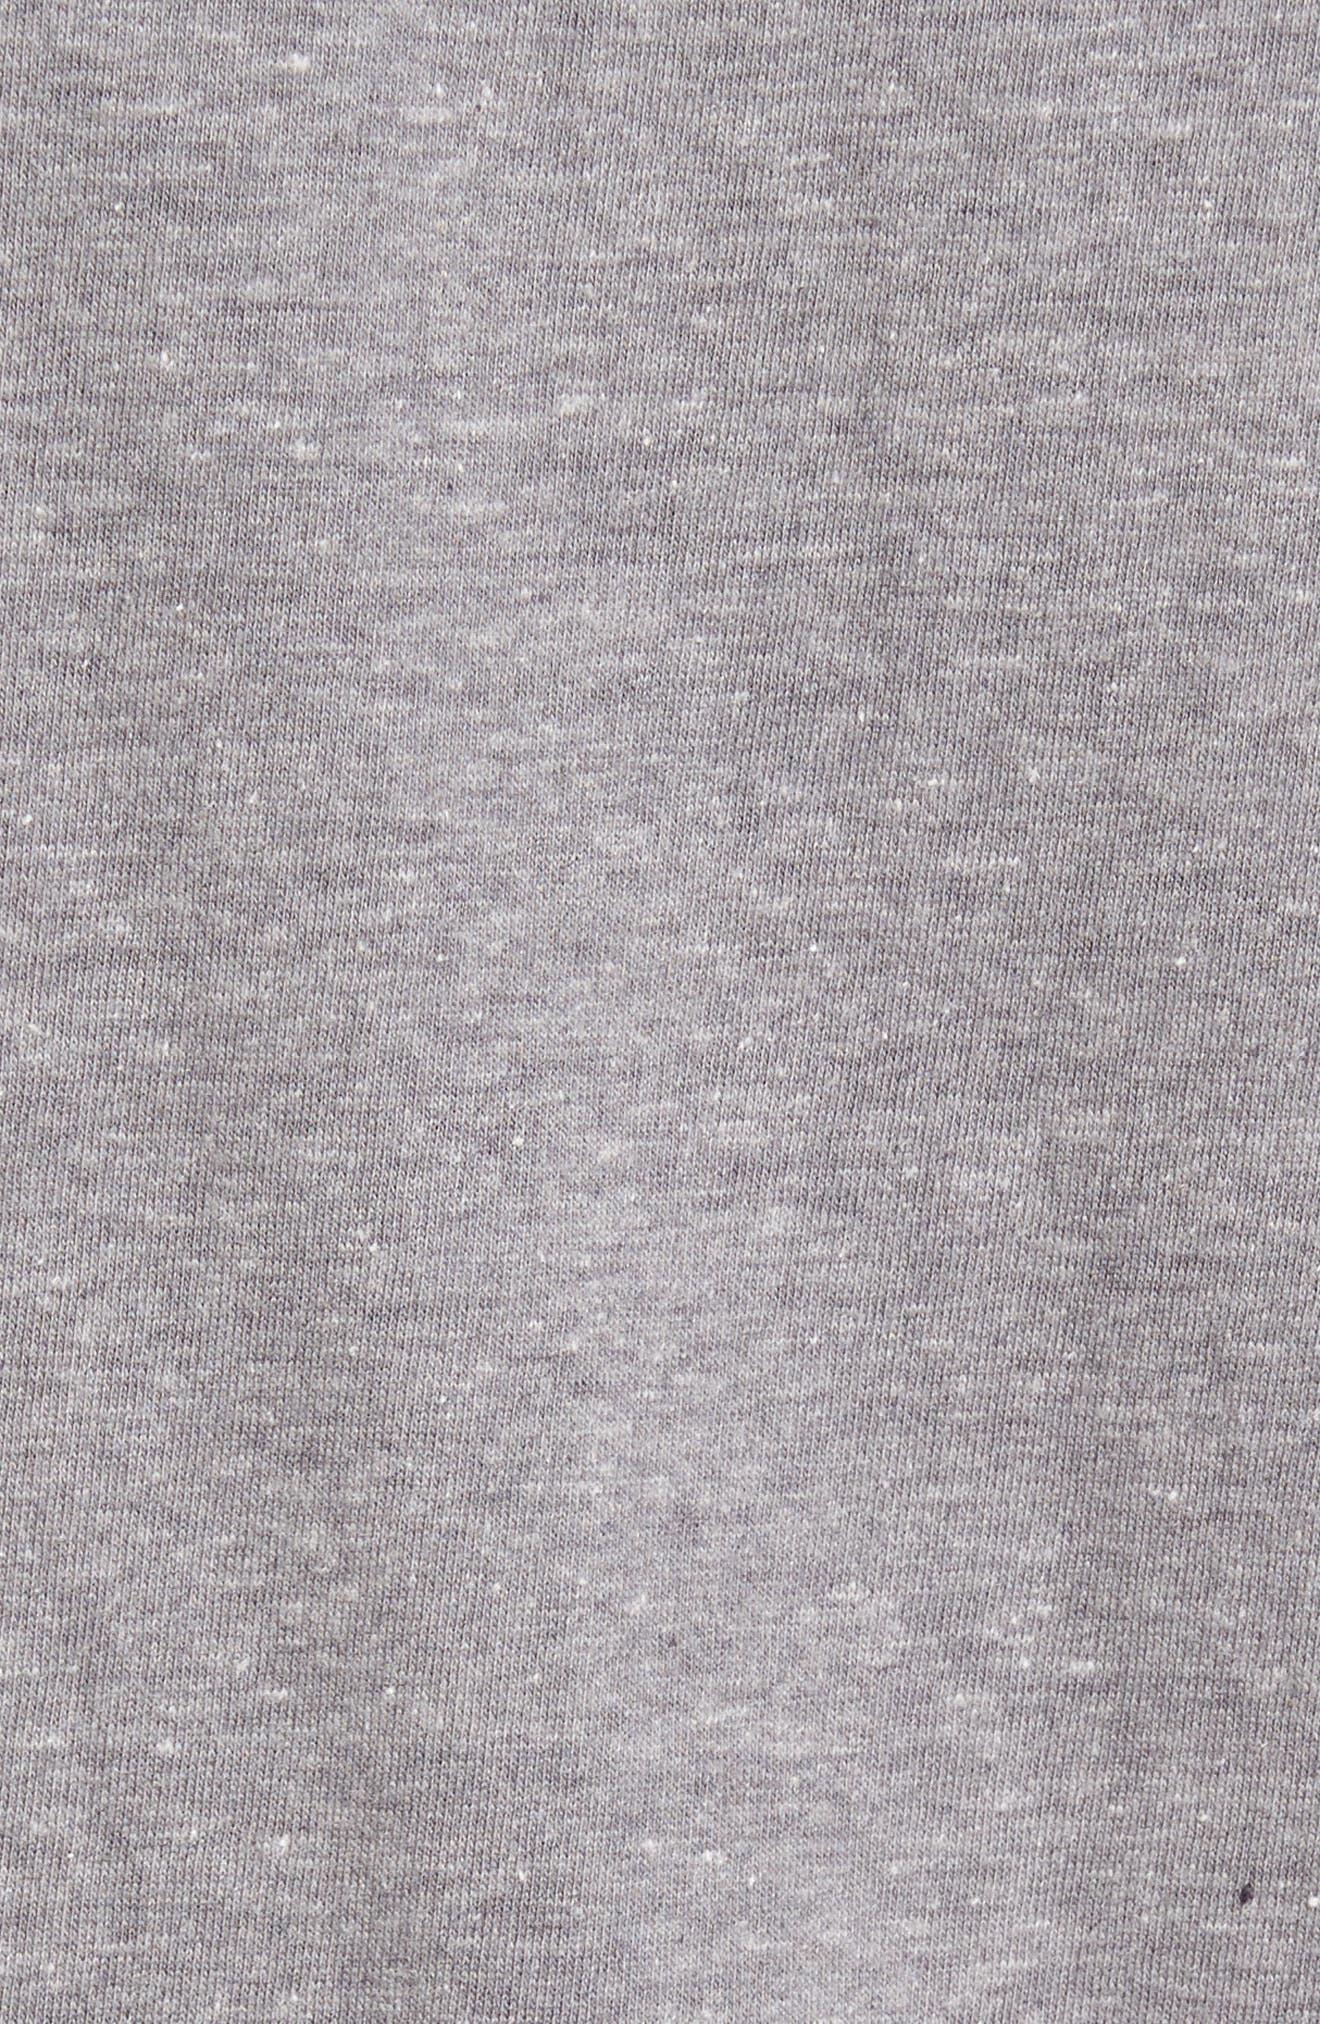 Sportswear Flight T-Shirt,                             Alternate thumbnail 5, color,                             091